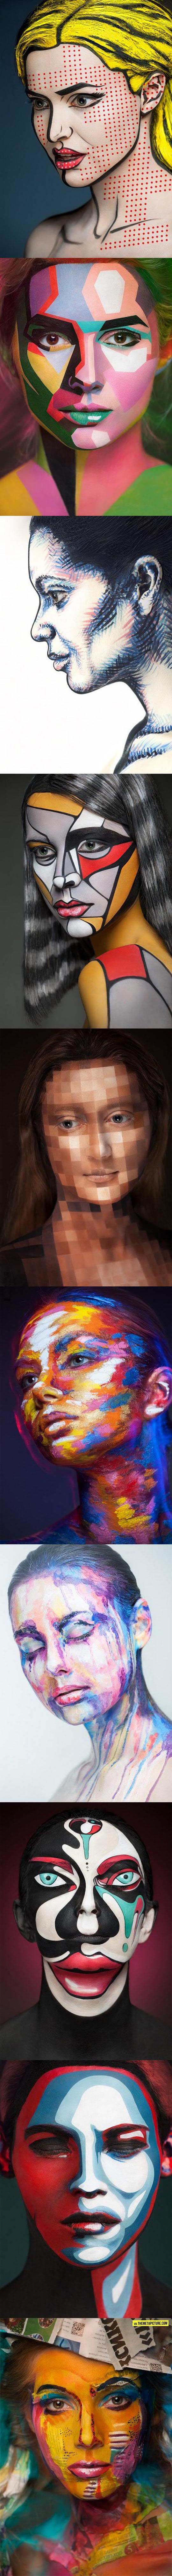 art-cool-face-paint-make-up